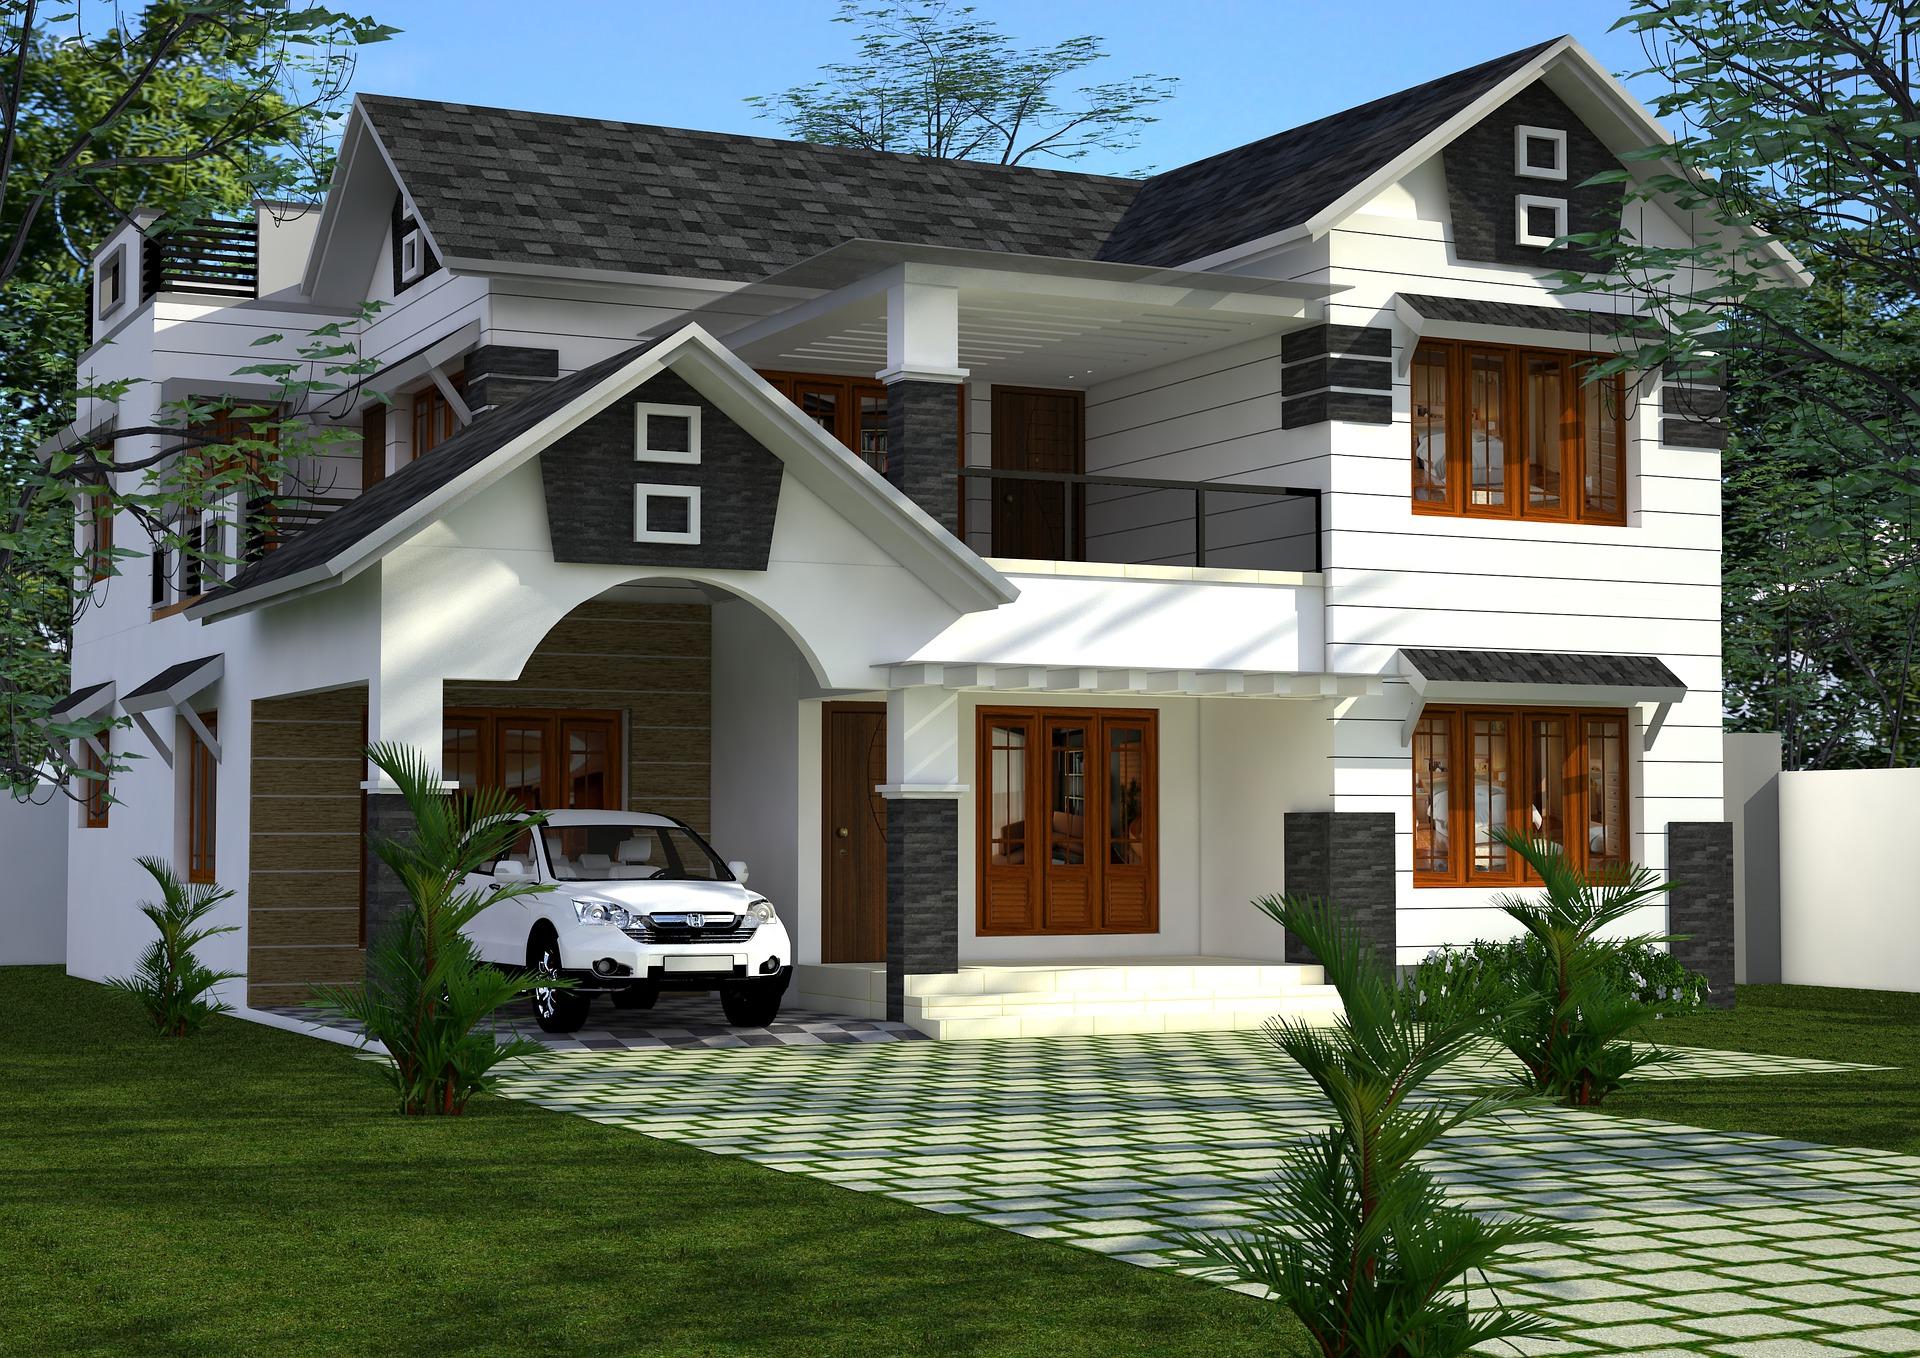 Domov projekt design